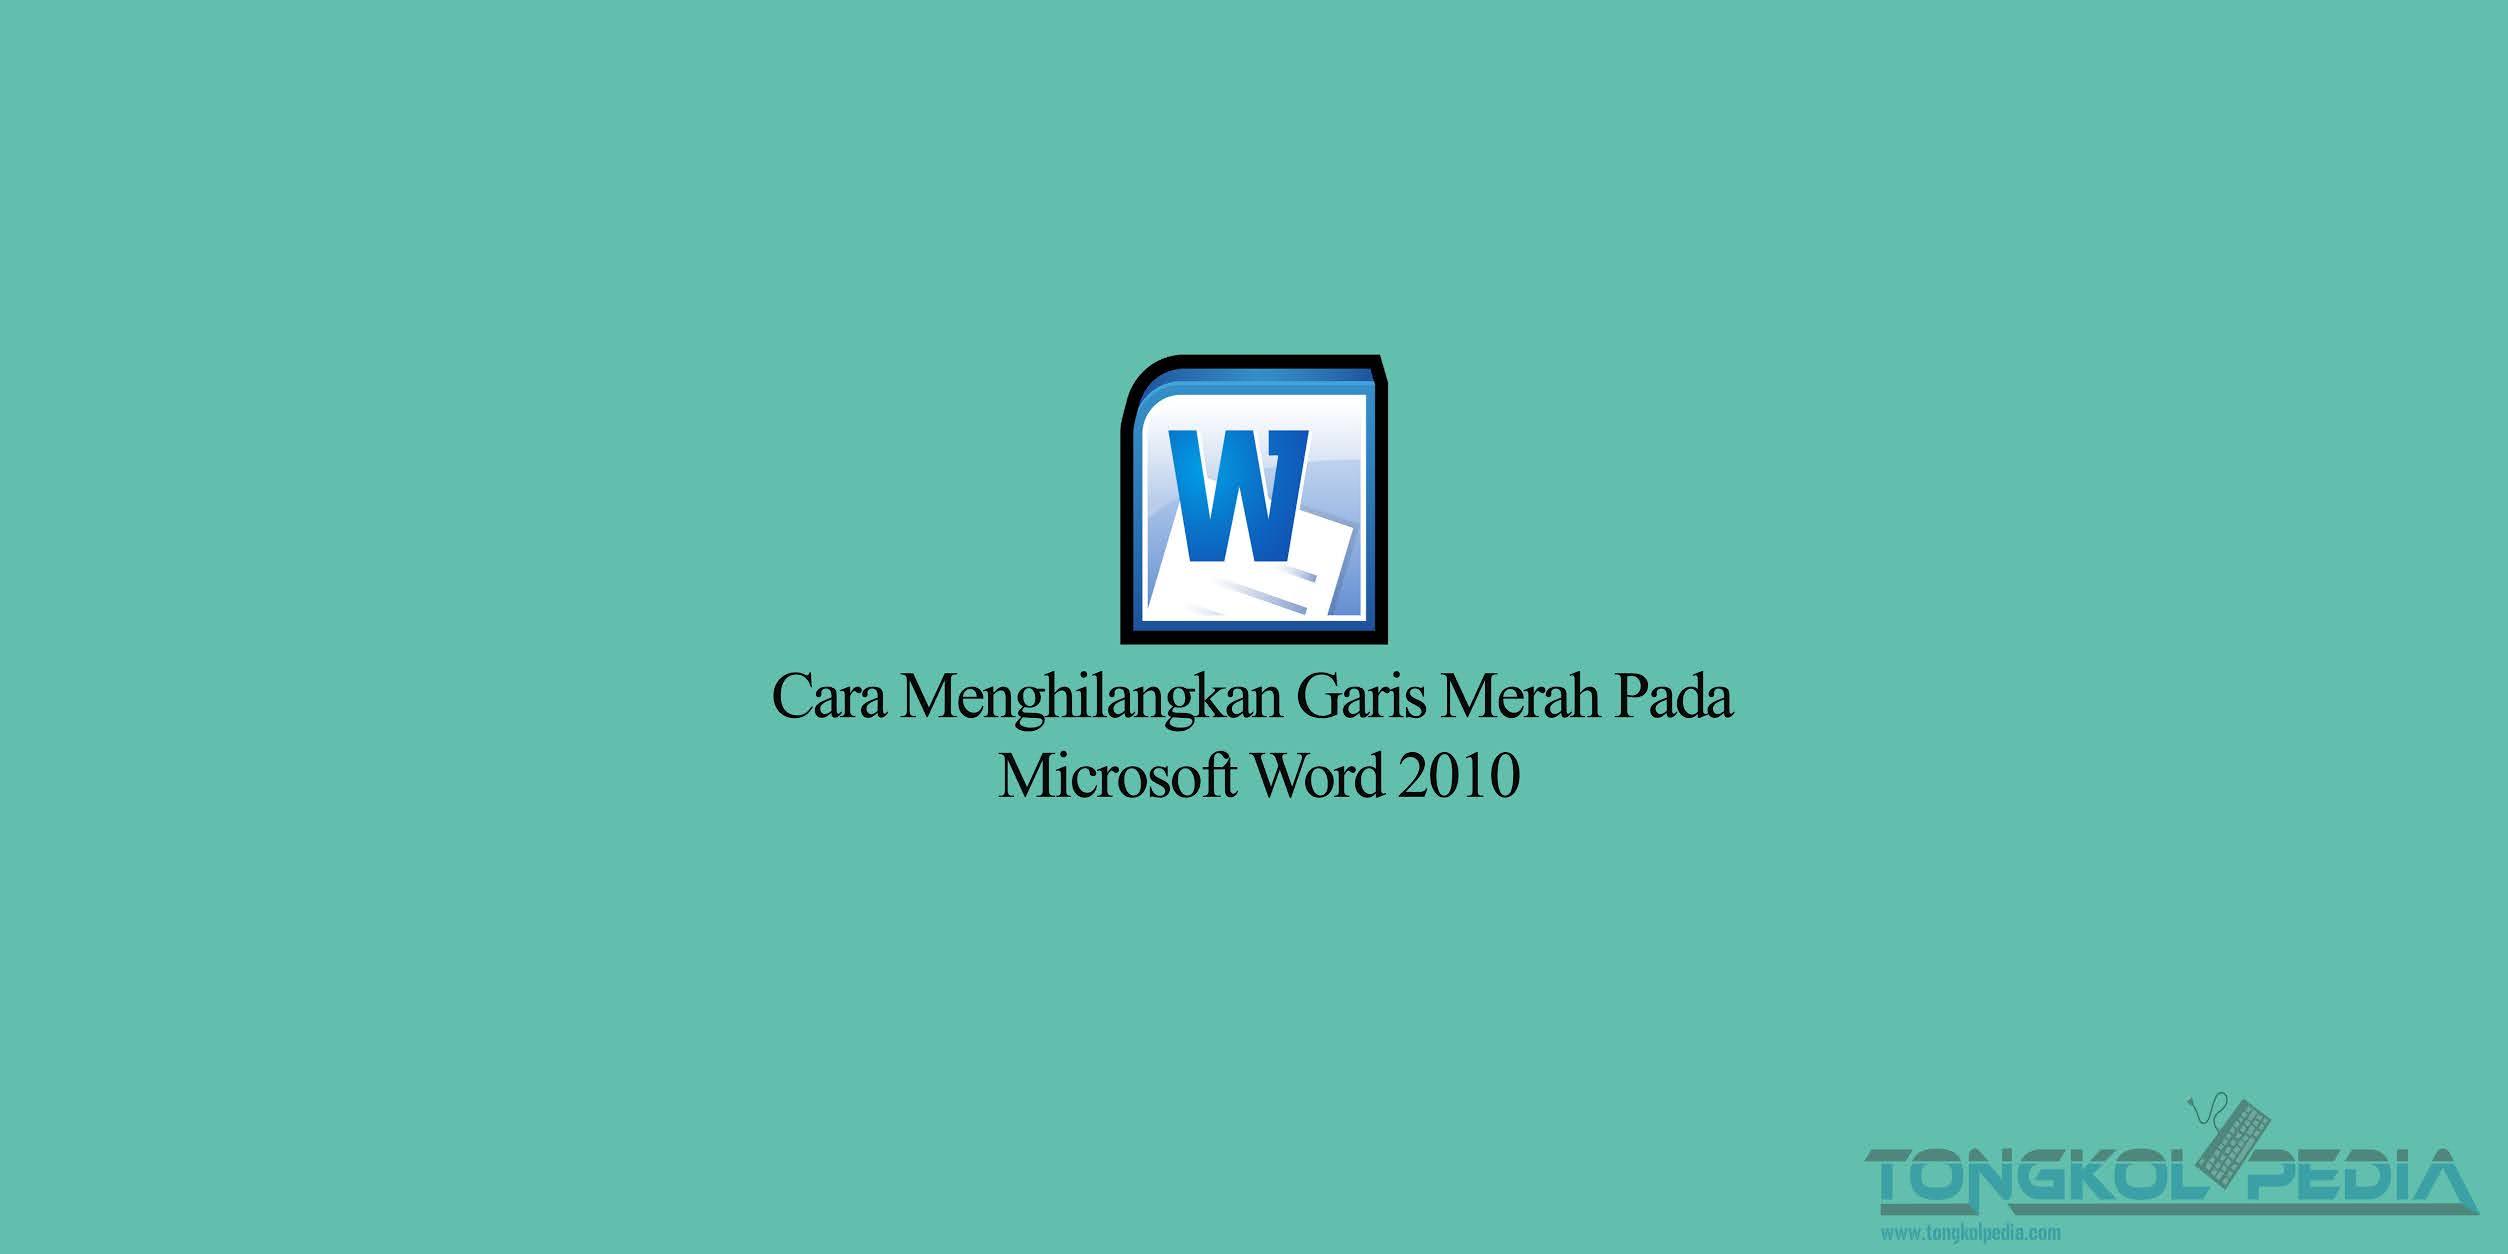 Cara Menghilangkan Garis Merah Pada Micrososft Word 2010